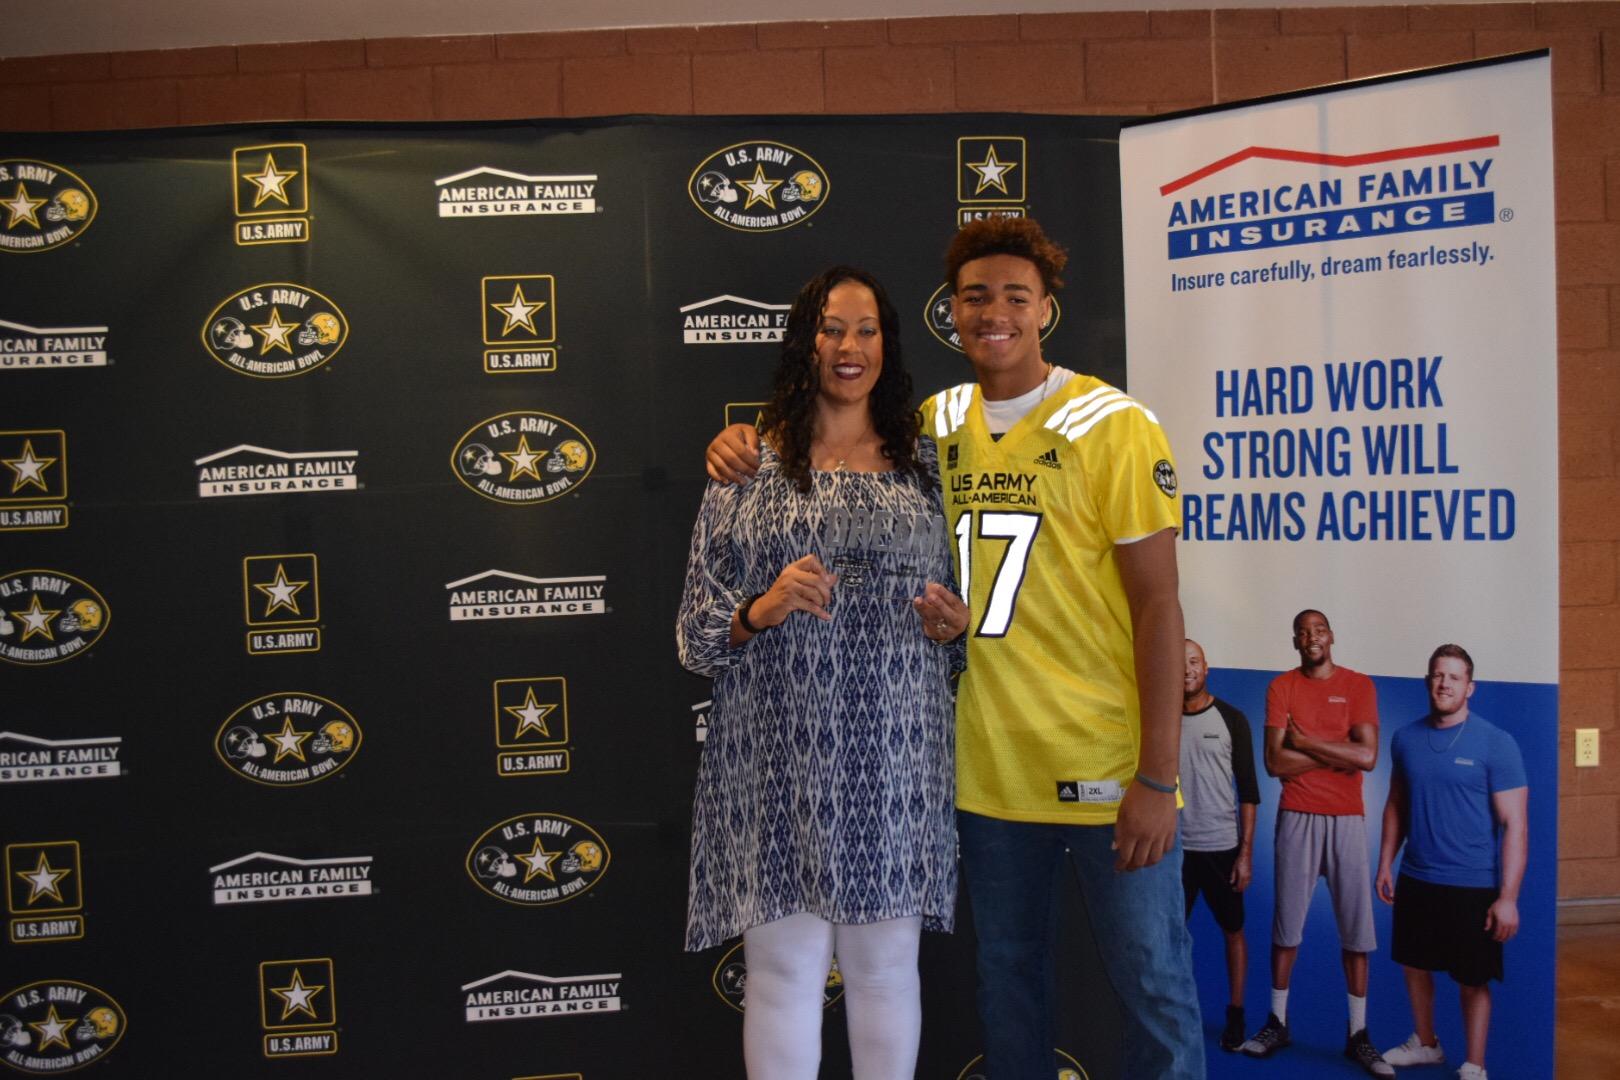 Hunter Echols' American Family Insurance Dream Champion award was presented to his mother, Laronda Echols (Photo: Army All-American Bowl)